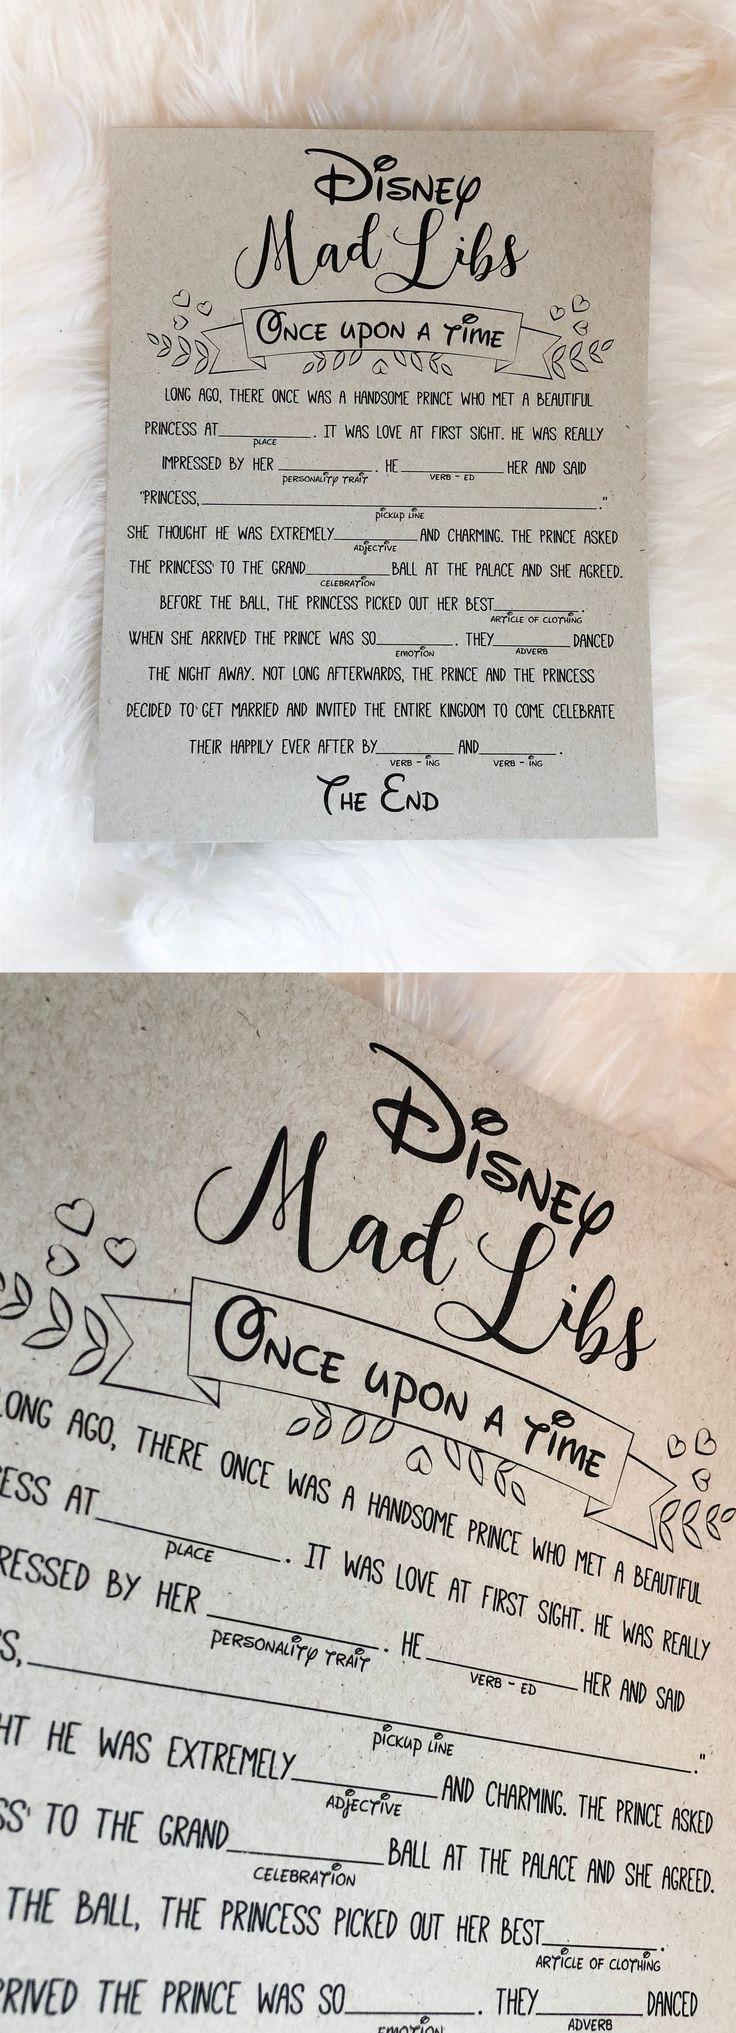 Disney mad libs Disney bridal shower games